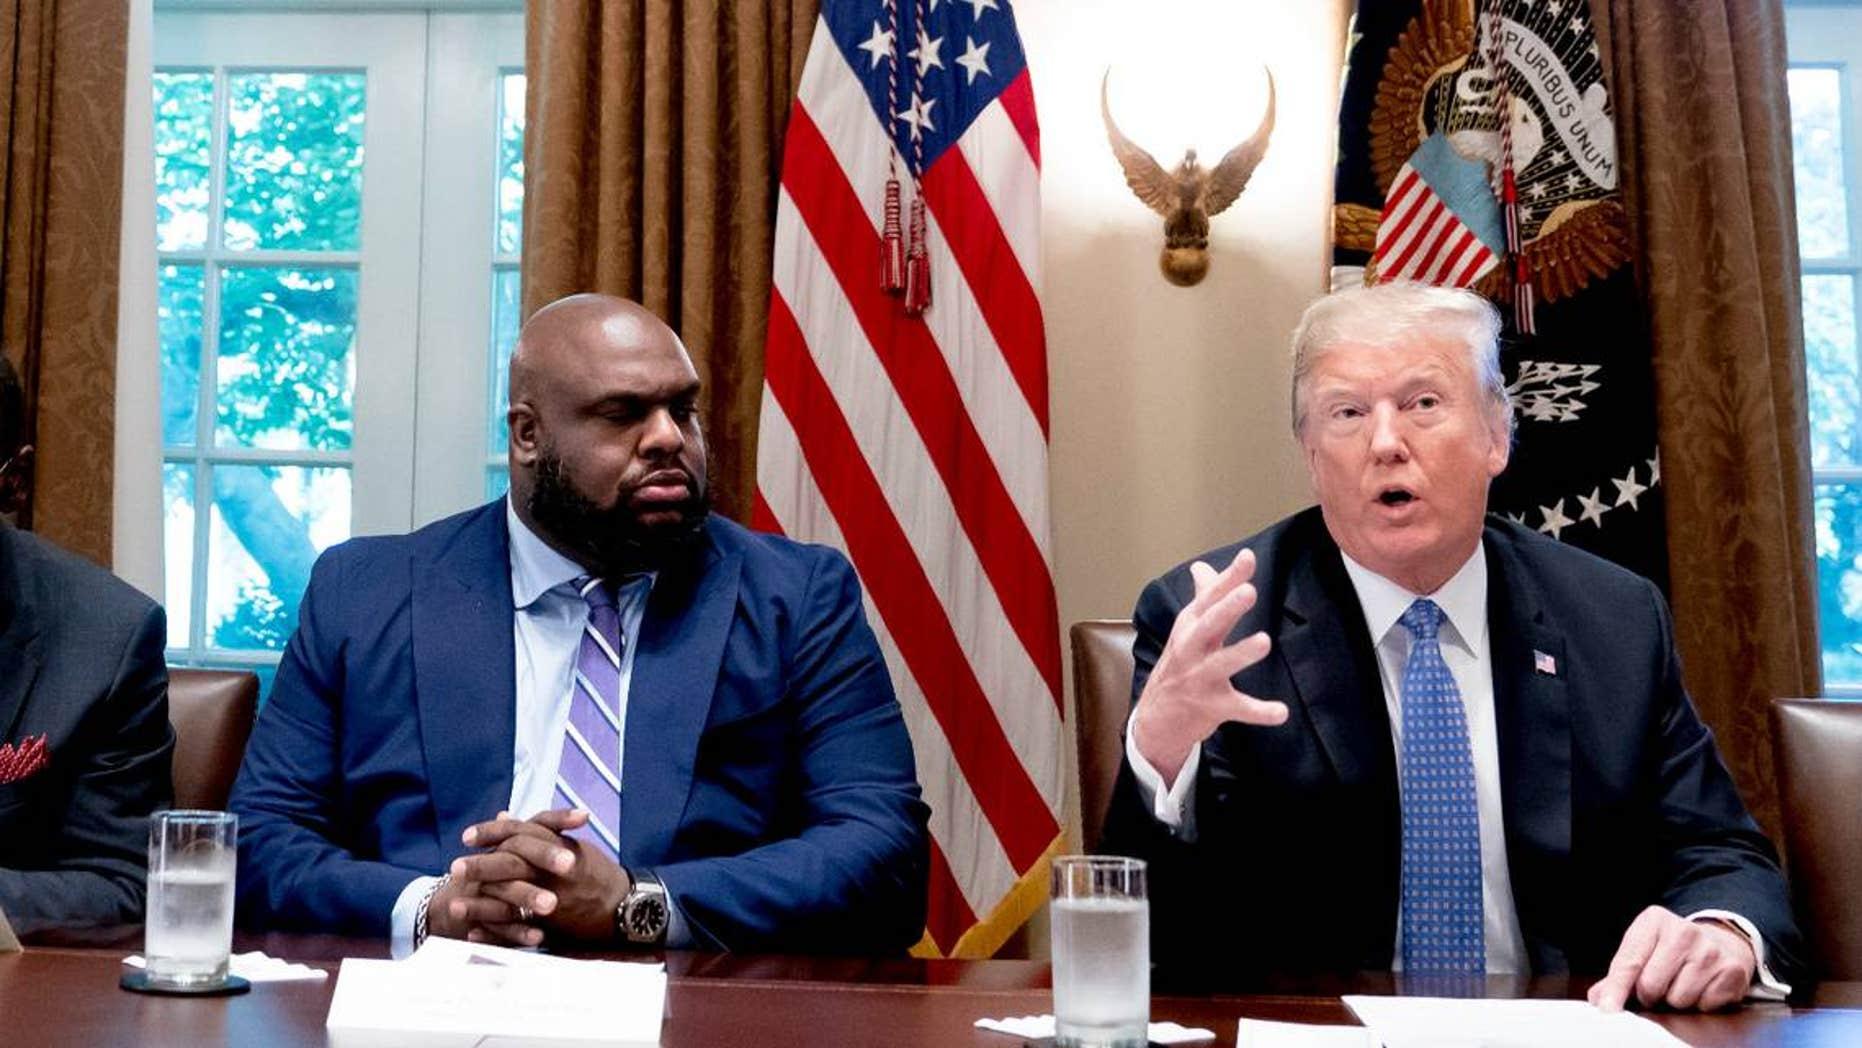 Black pastors see Trump bringing 'new hope' -- but still